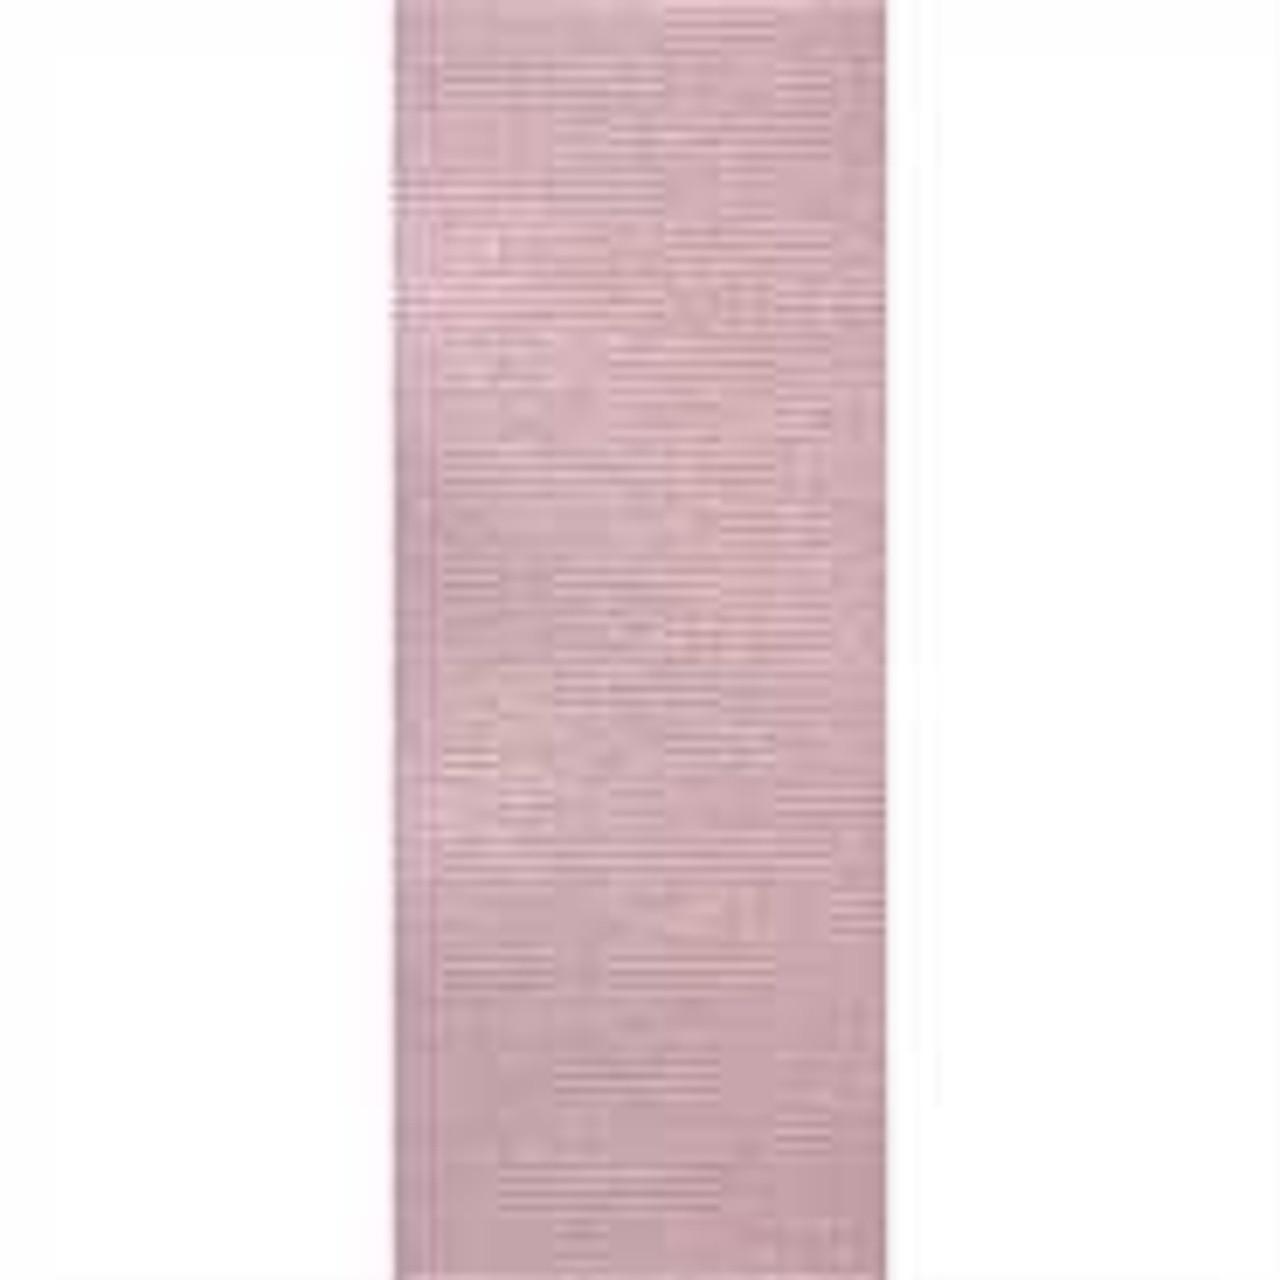 Lilac Sparkle Grosgrain Ribbon